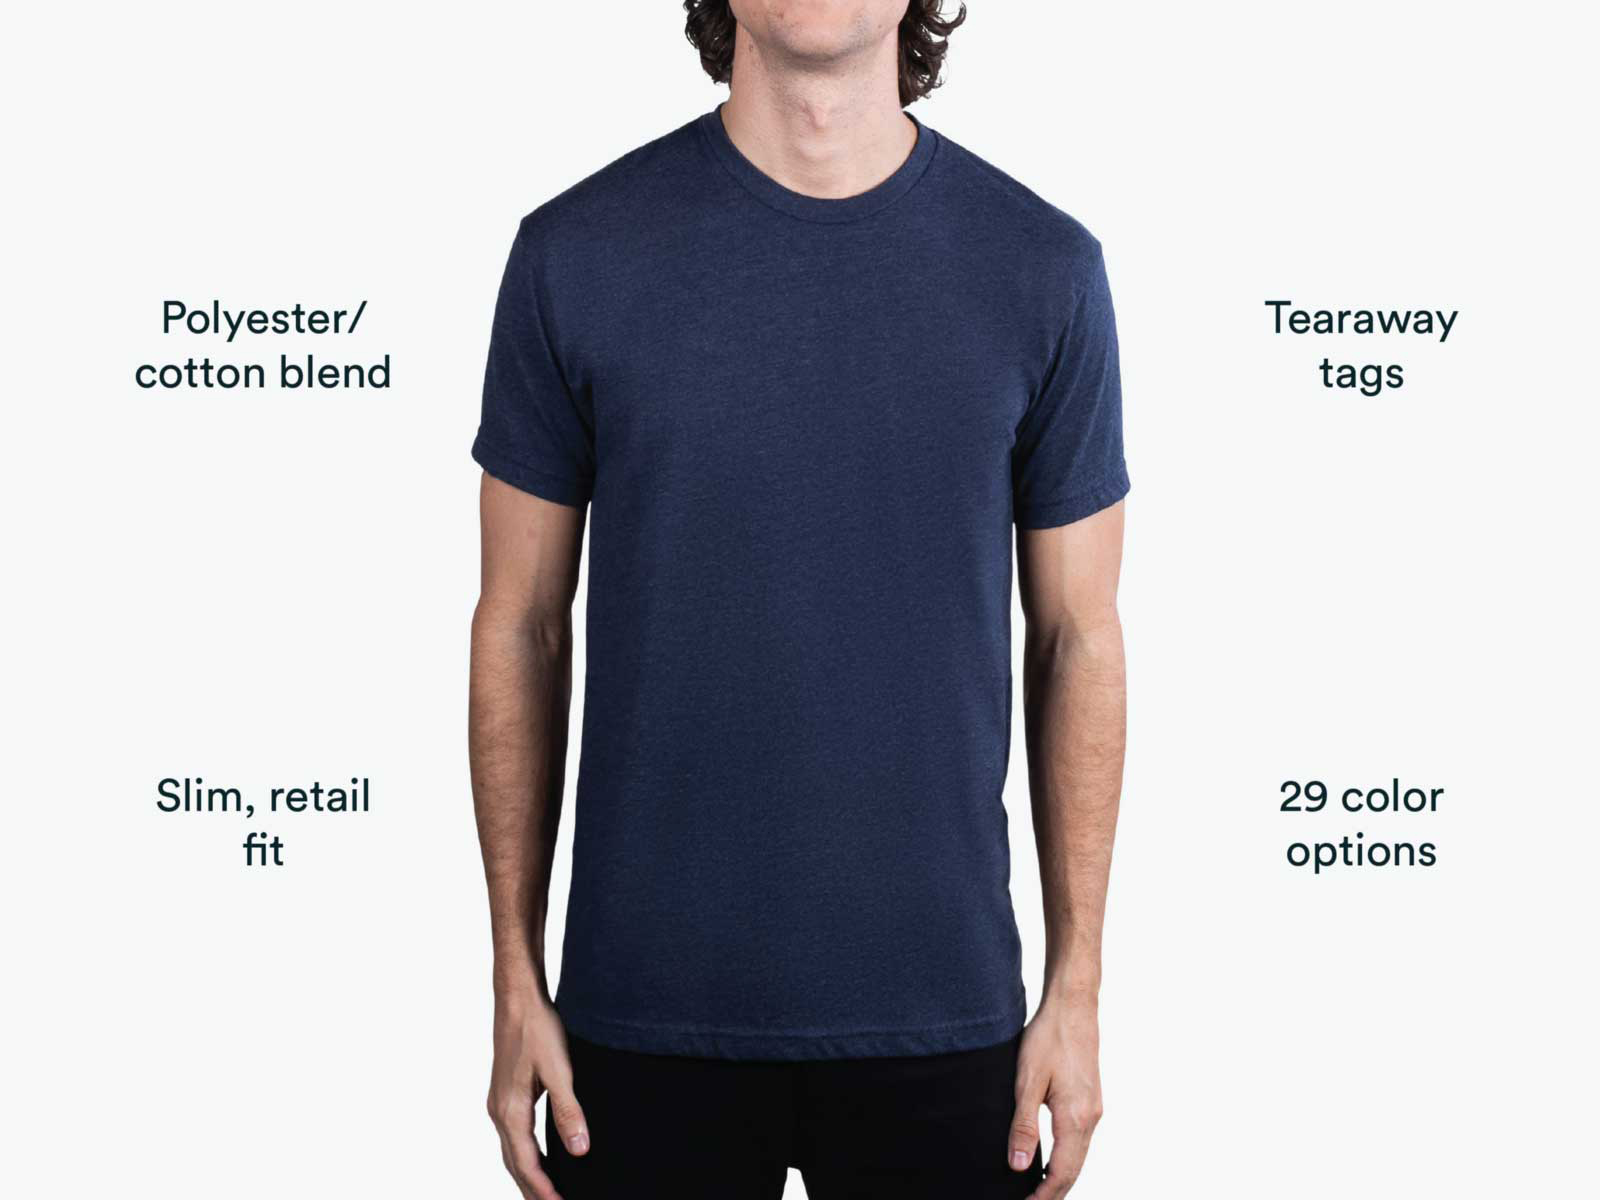 man wearing navy net level shirt